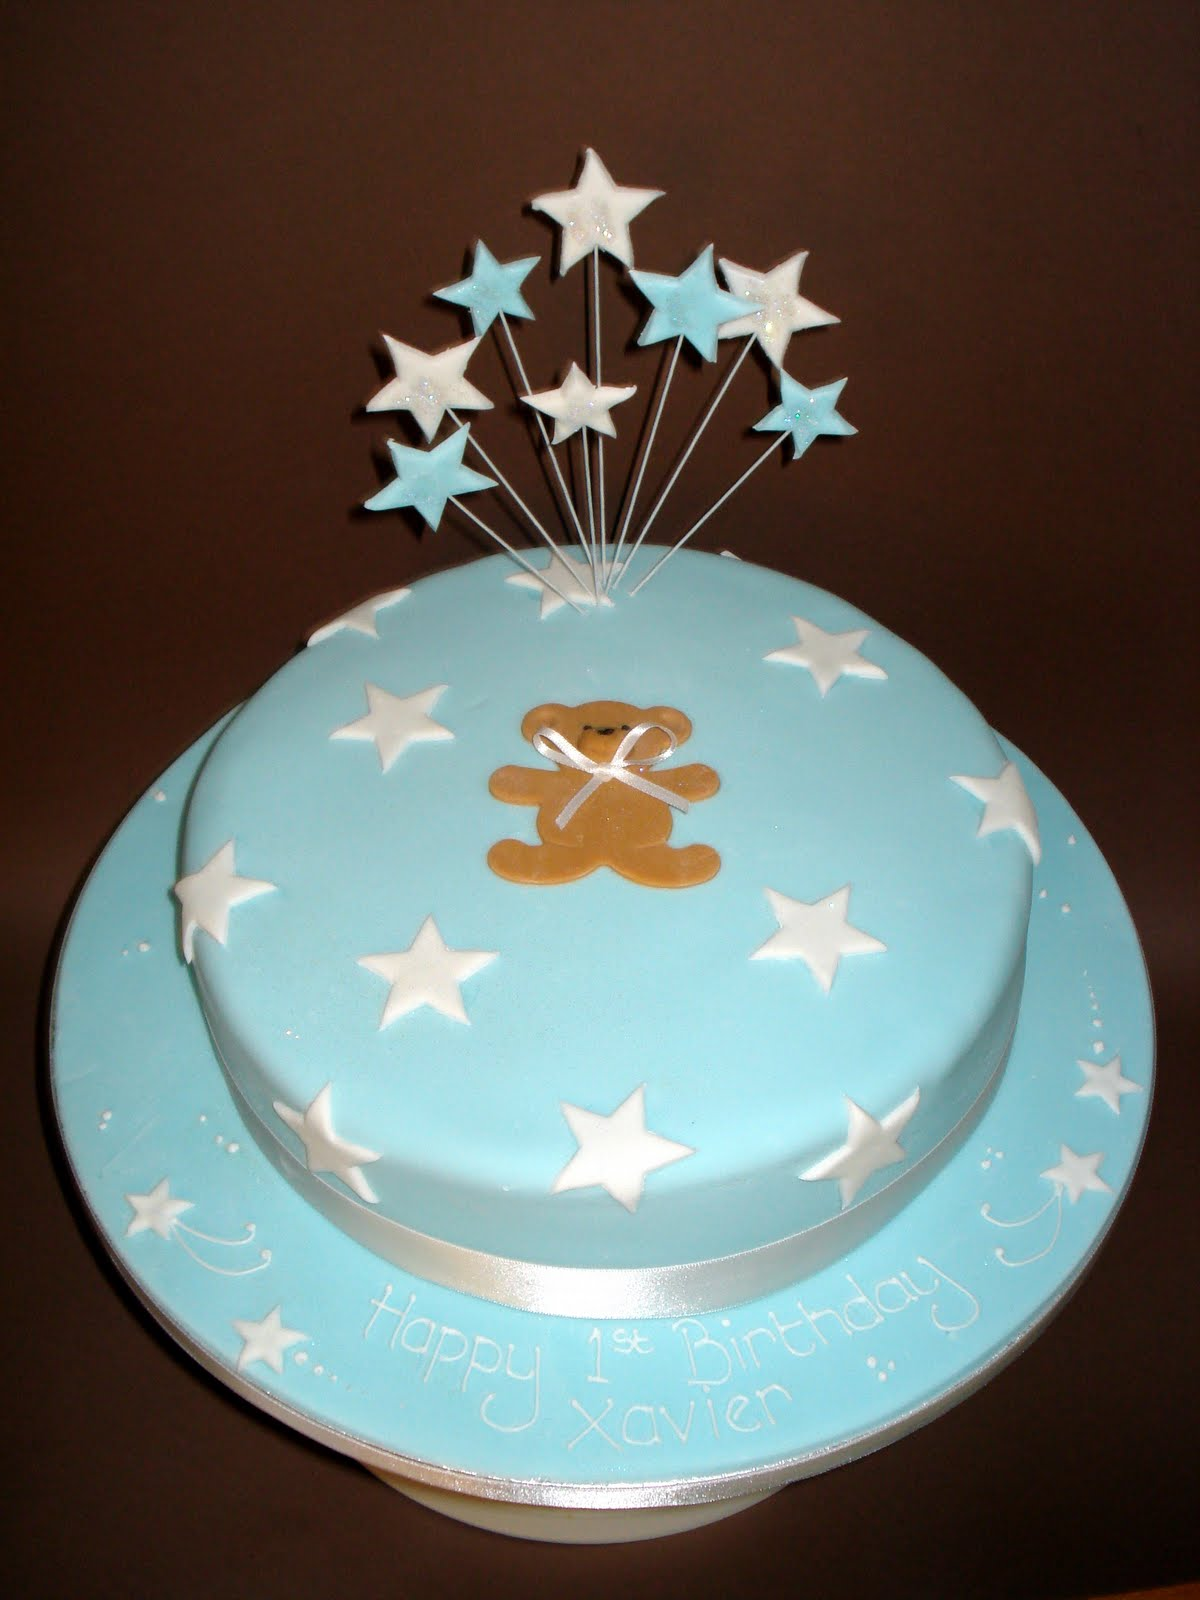 Custom Cake Designs Uk : Custom Cake Design: Teddy and Stars cake